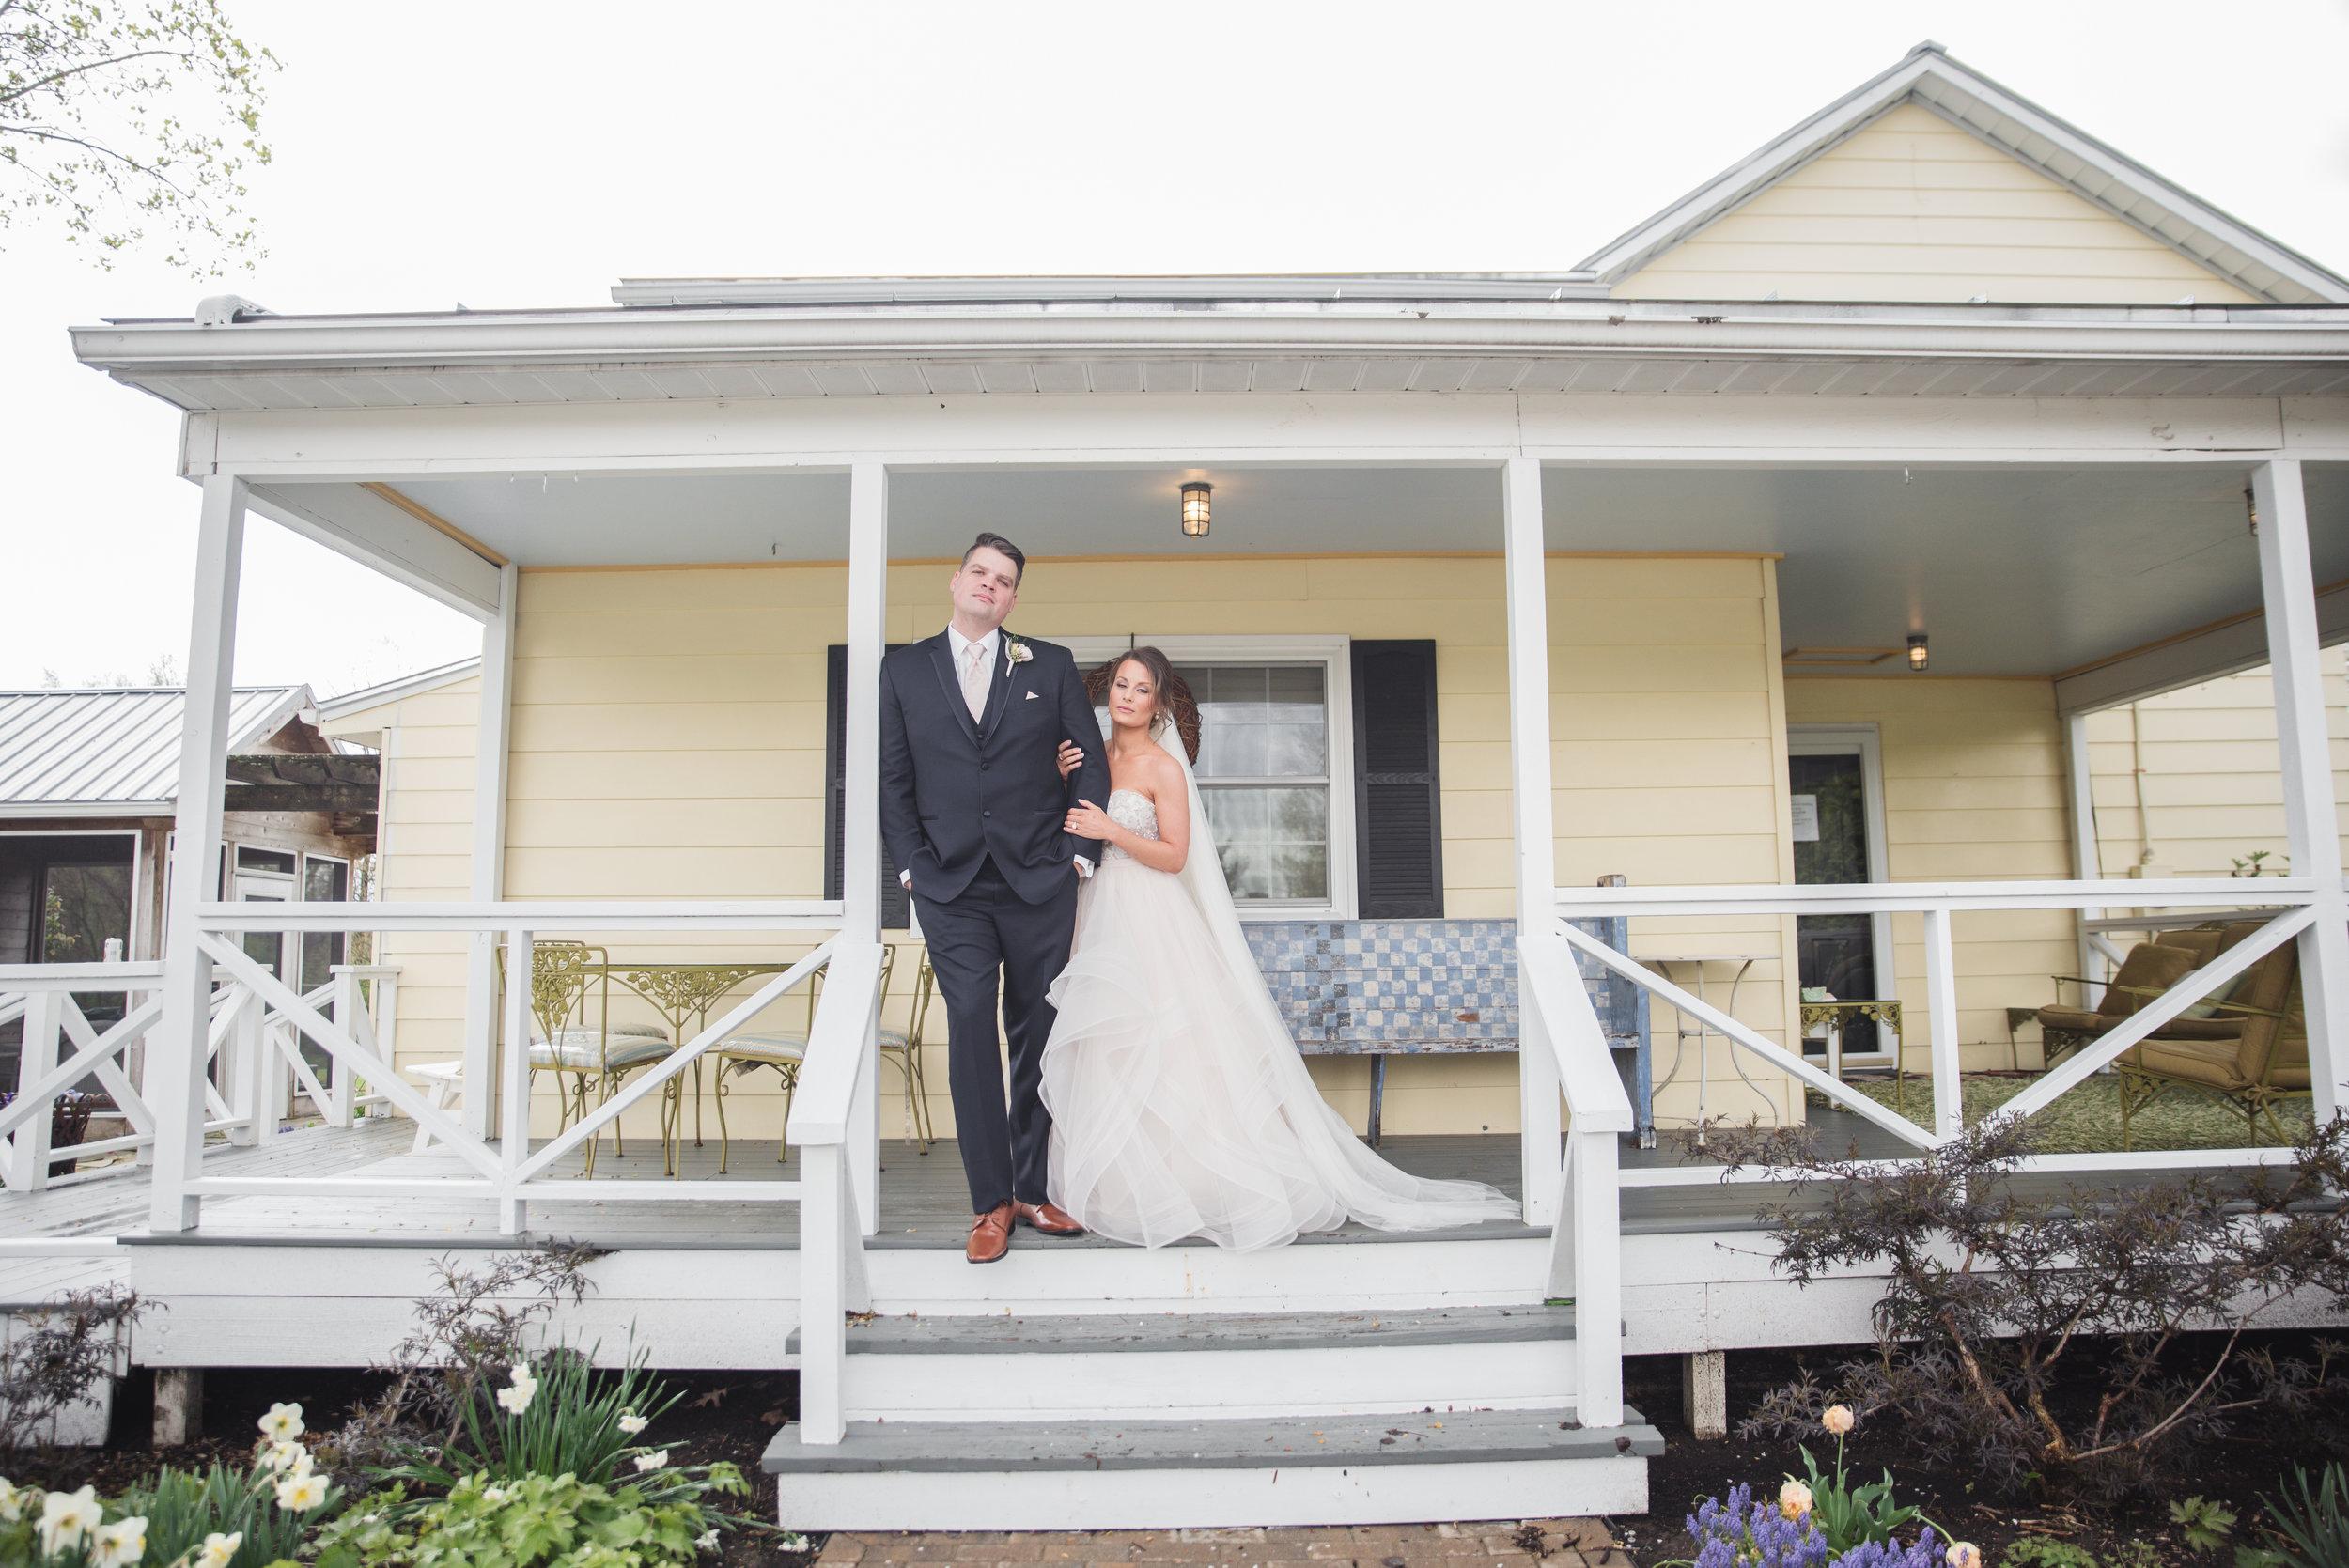 wedding photographer off camera flash